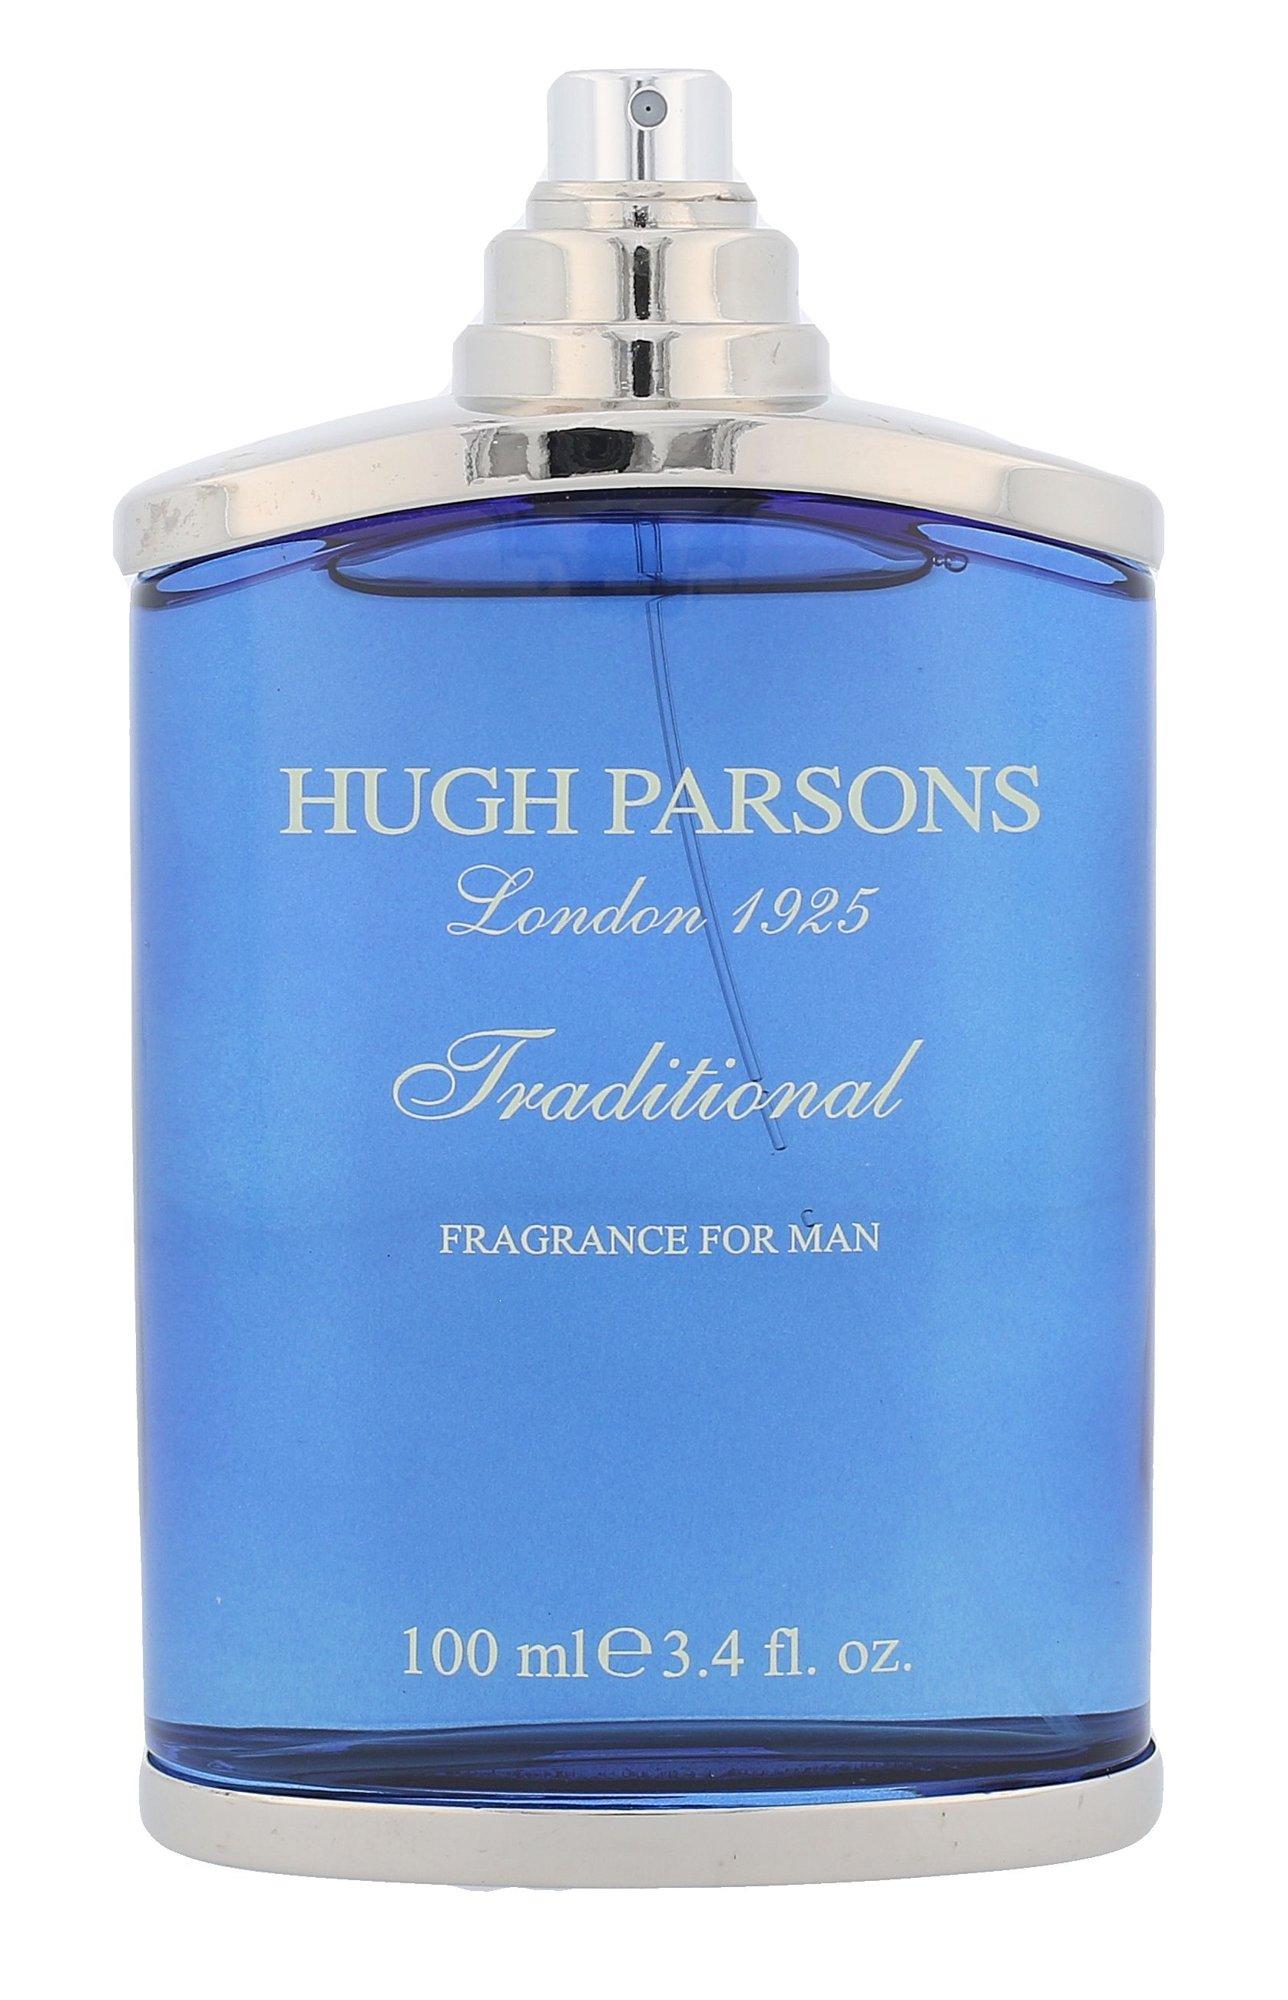 Hugh Parsons Traditional EDT 100ml